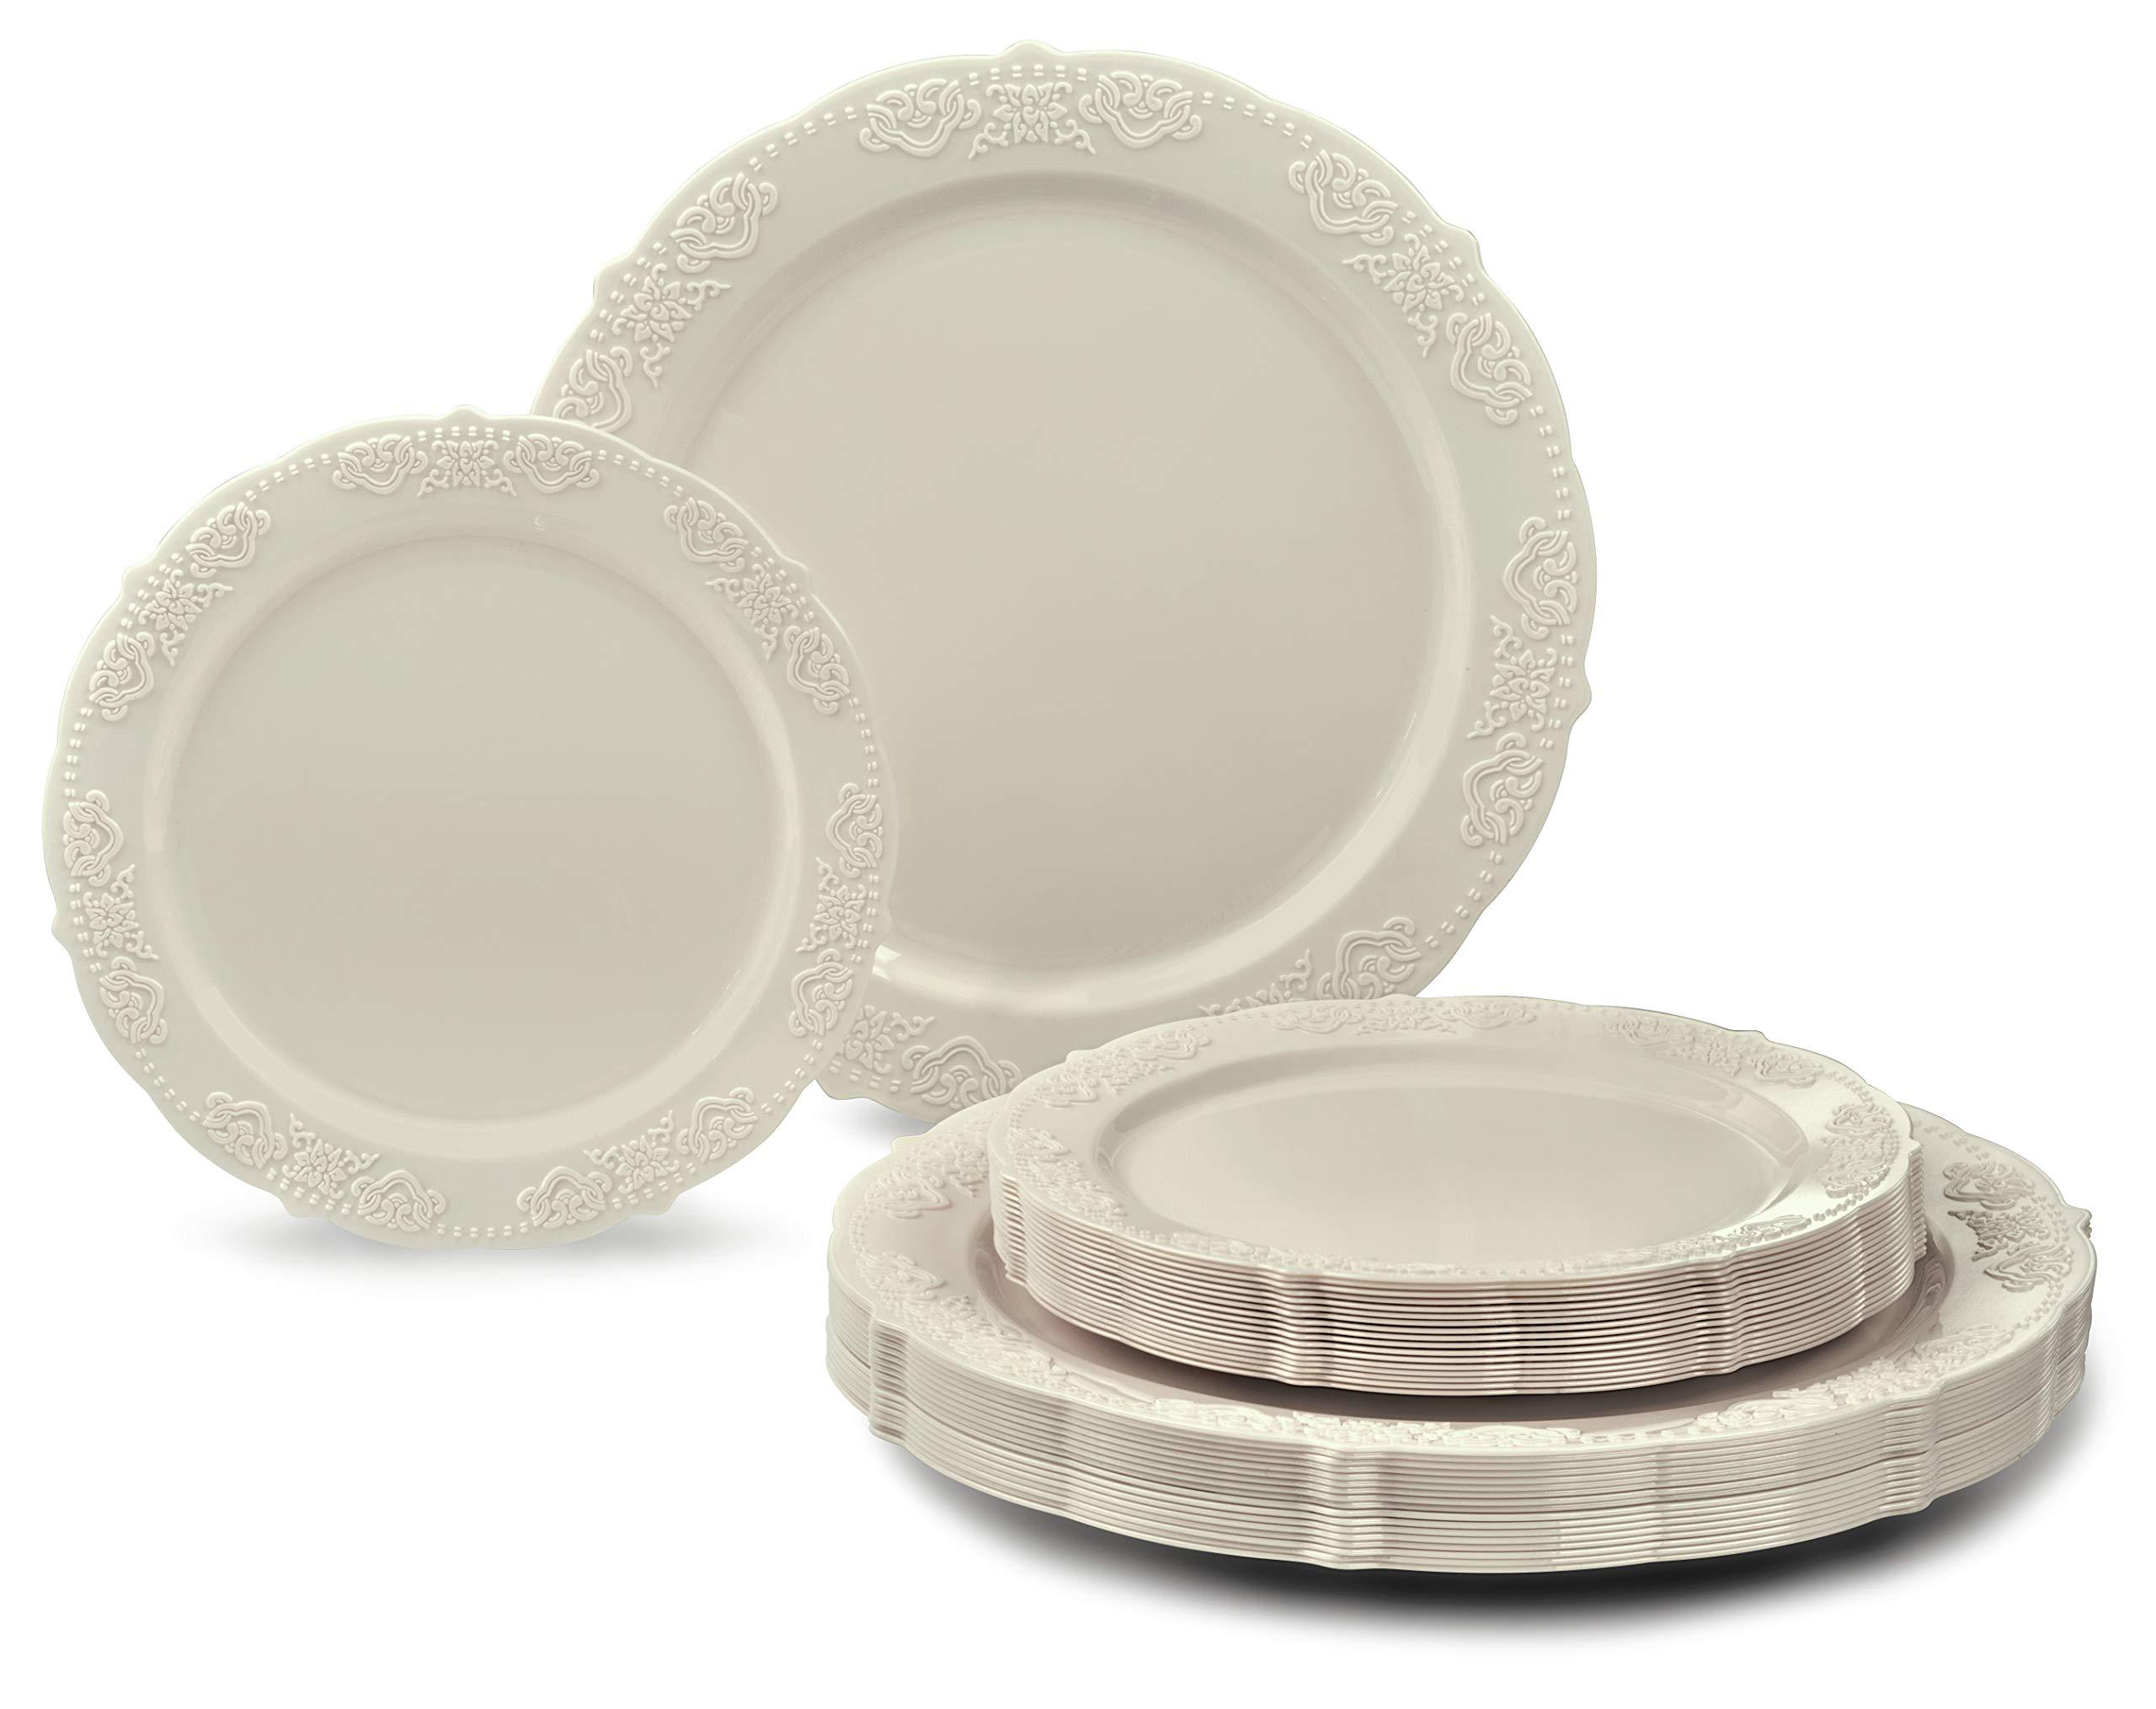 '' OCCASIONS'' 240 PACK Heavyweight Vintage Wedding Party Disposable Plastic Plates Set - 120 x 10.25'' Dinner + 120 x 7.5'' Salad/Dessert Plate (Portofino Ivory)